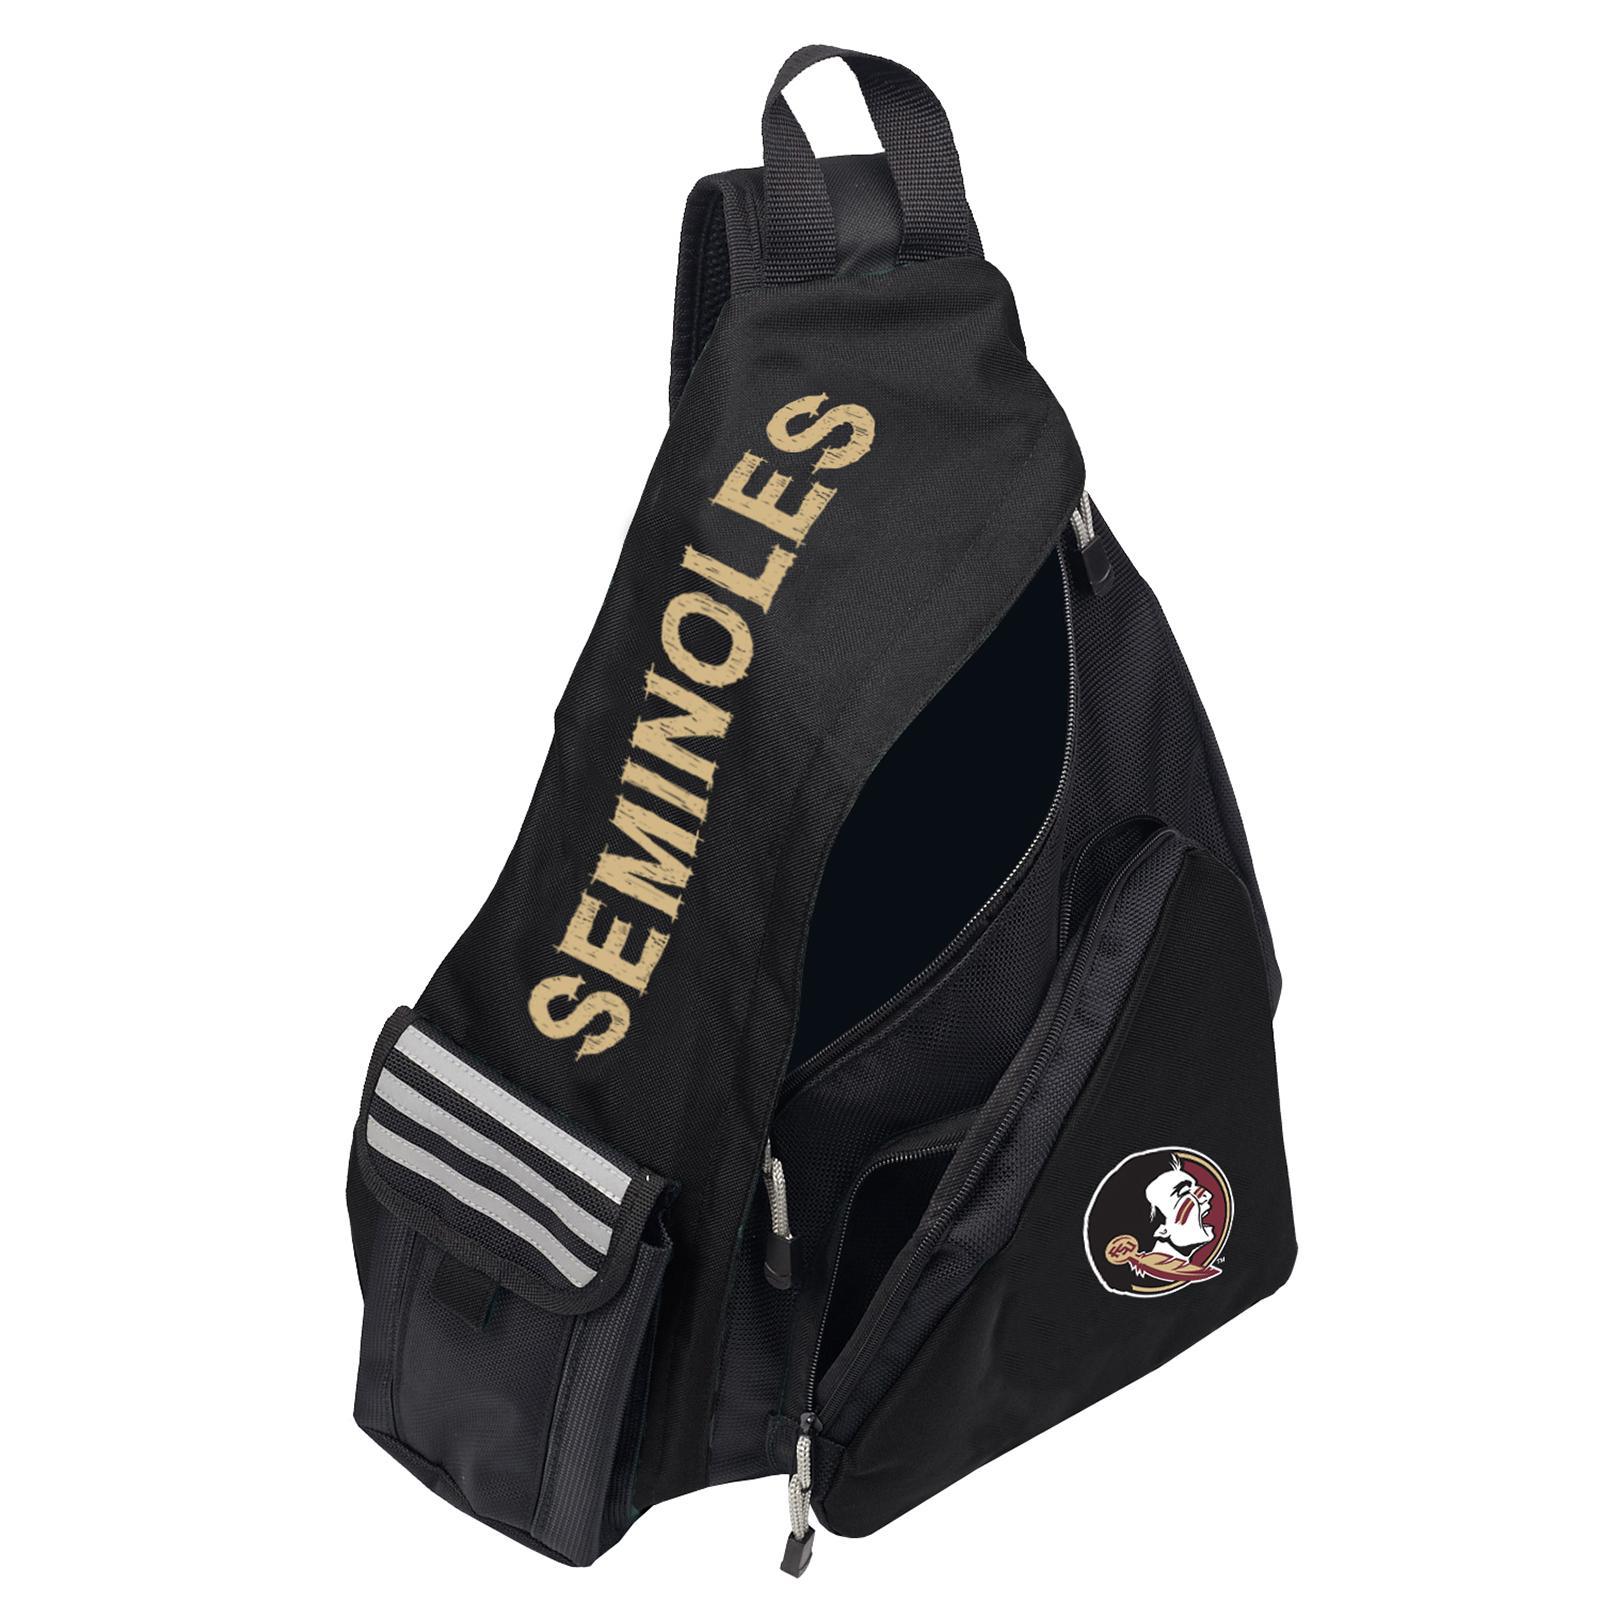 Sling Backpack - Florida State Seminoles